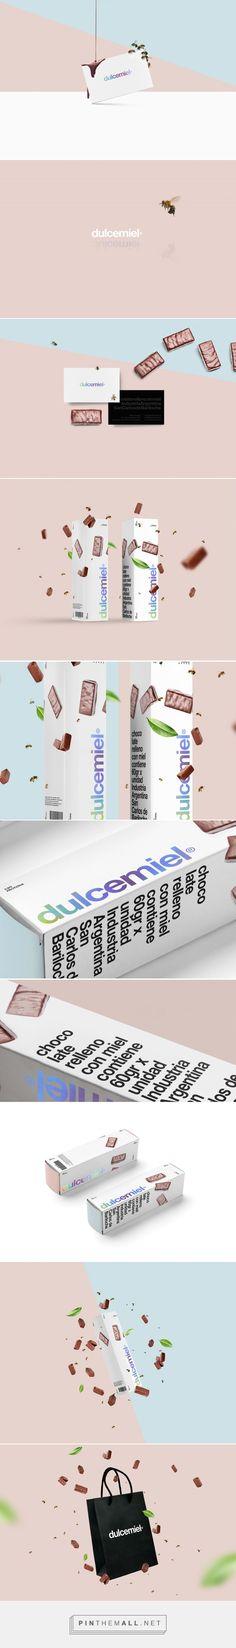 Dulcemiel by Cabra Negra Estudio